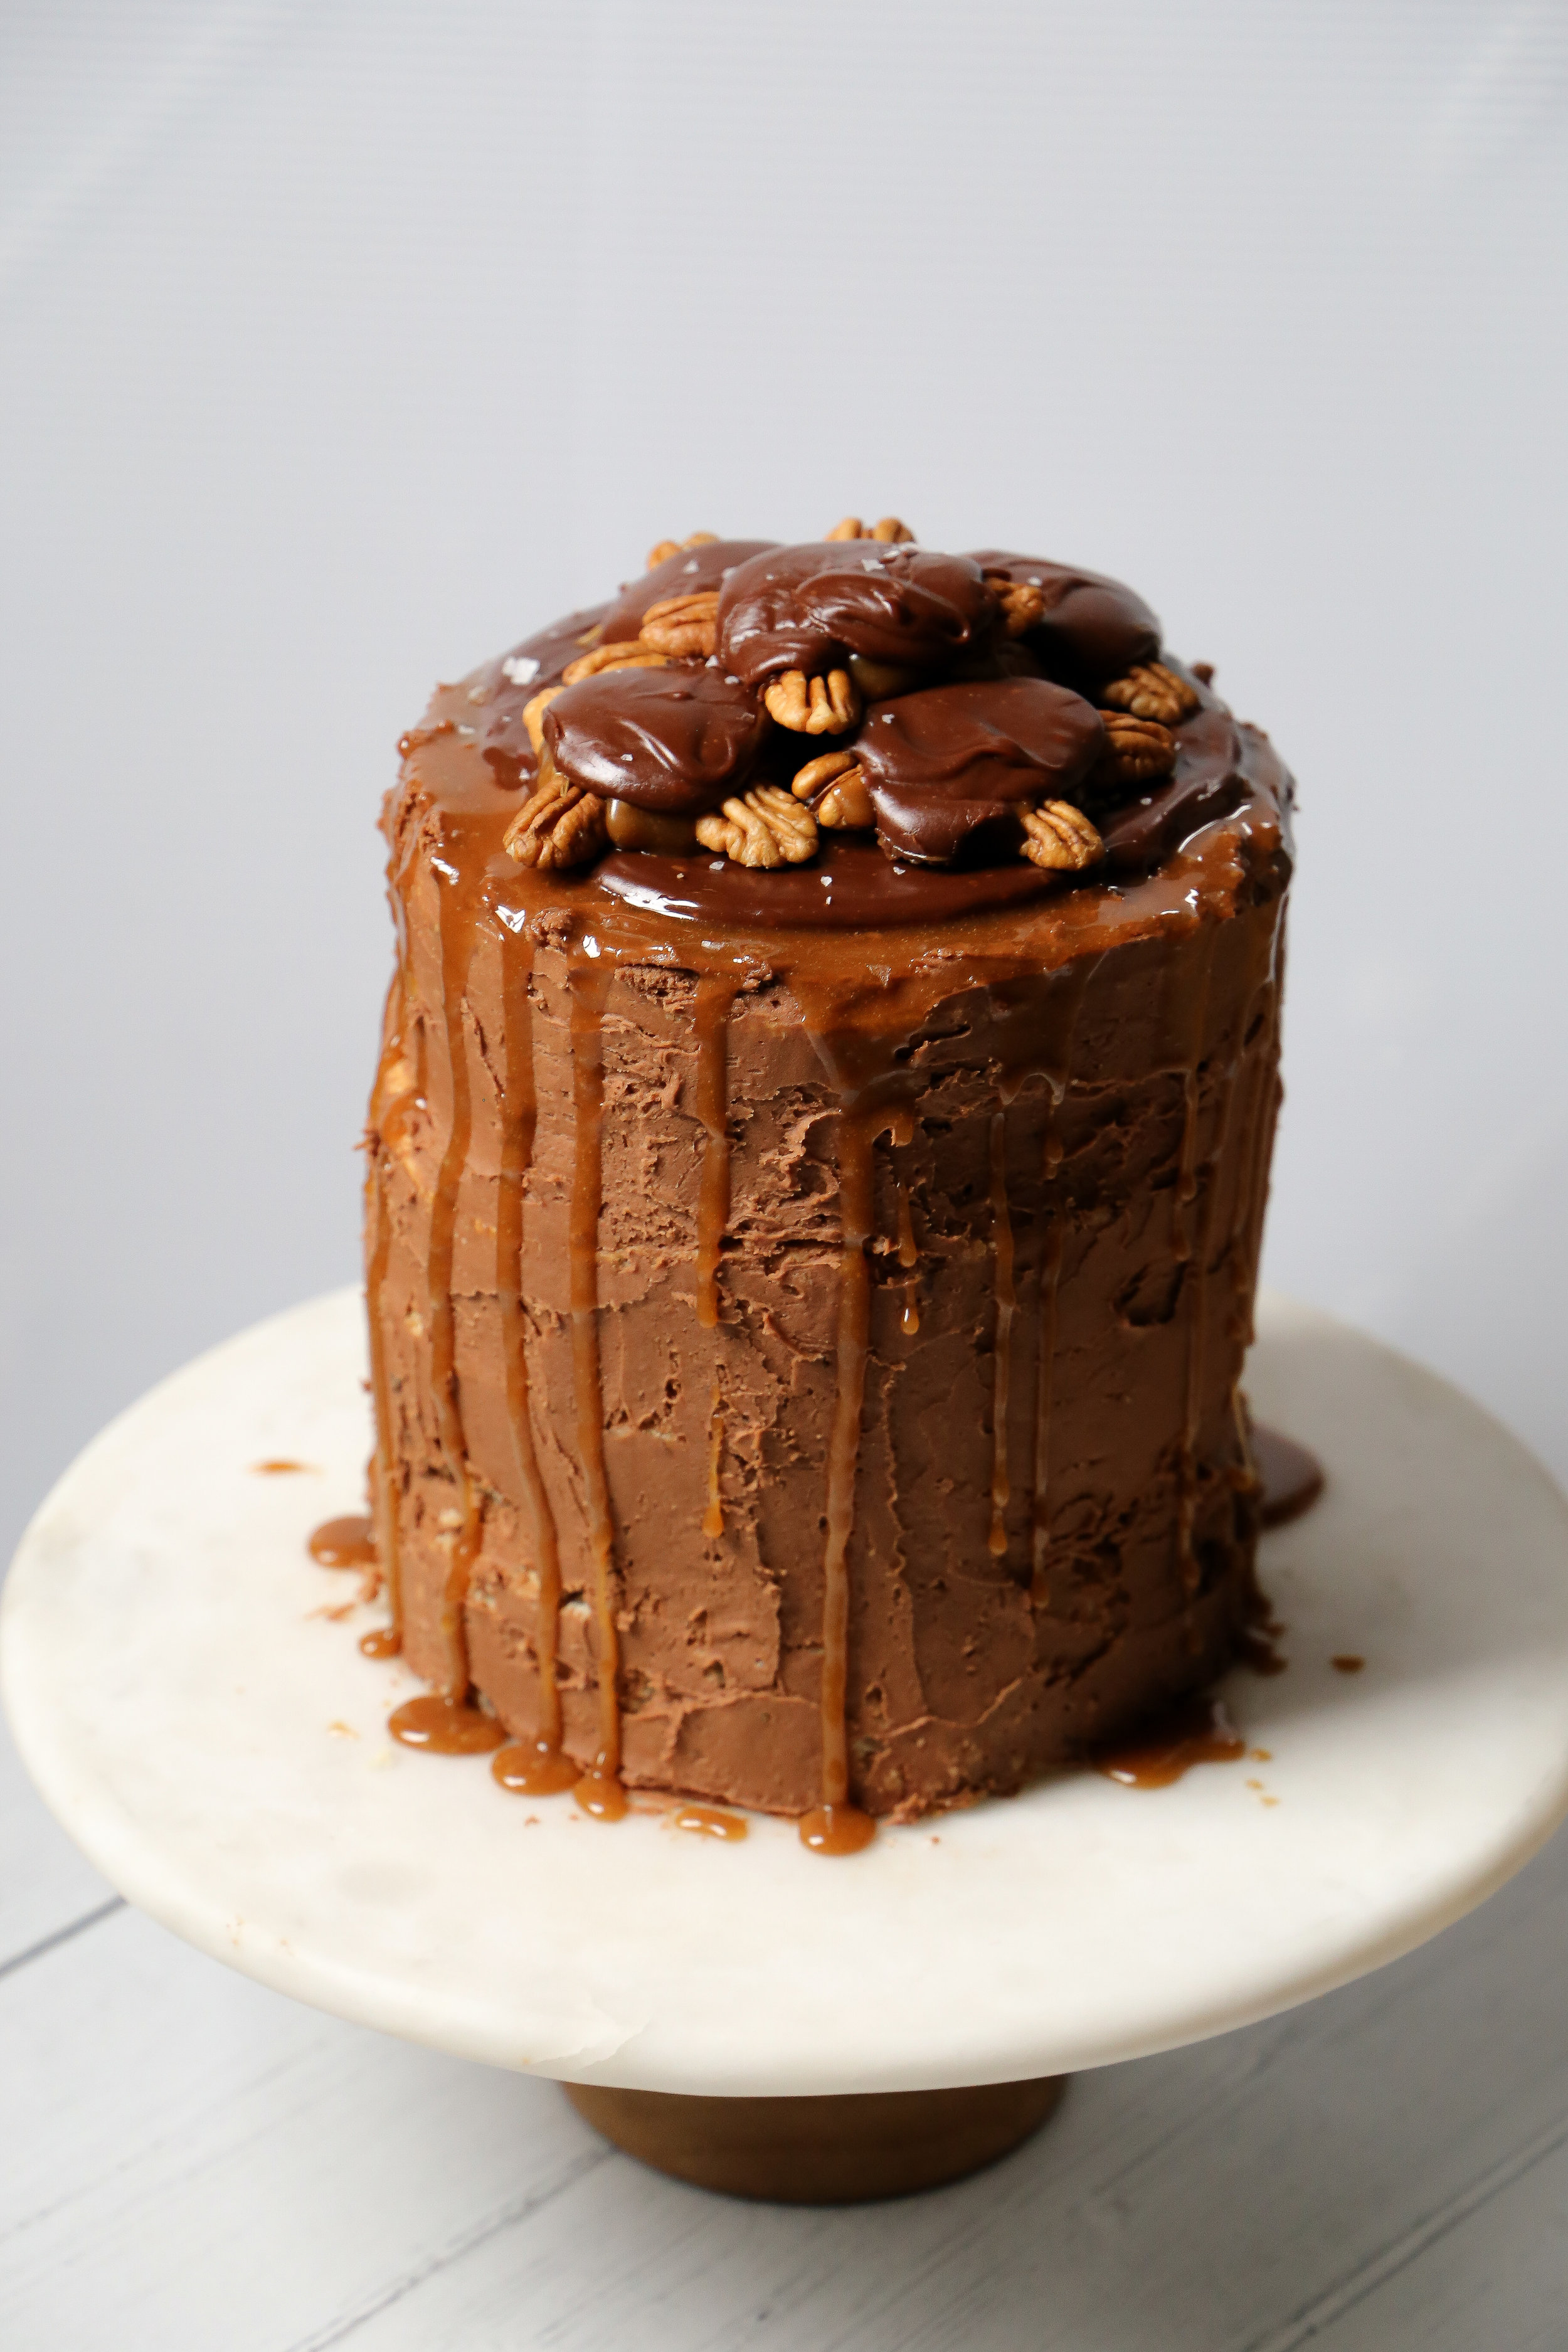 Chocolate Turtle Cake - An indulgence and a half.